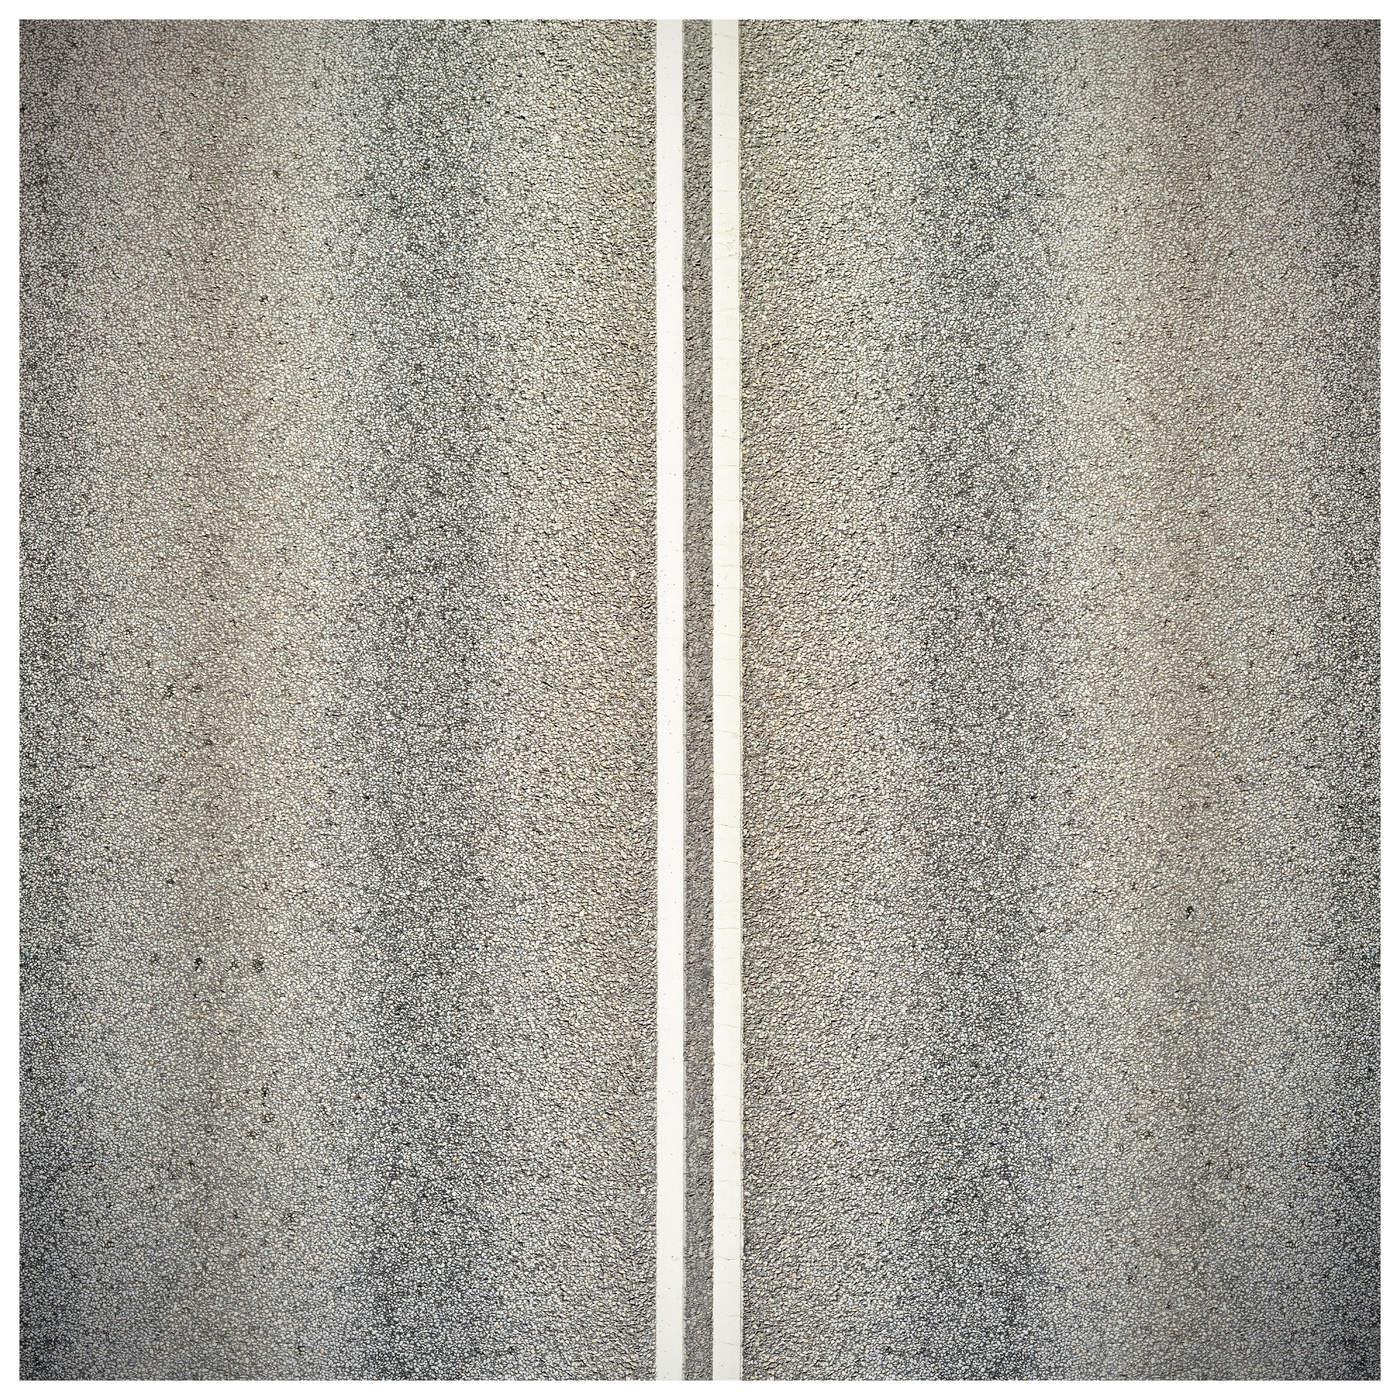 Sam Hunt - Body Like a Back Road - Single Cover